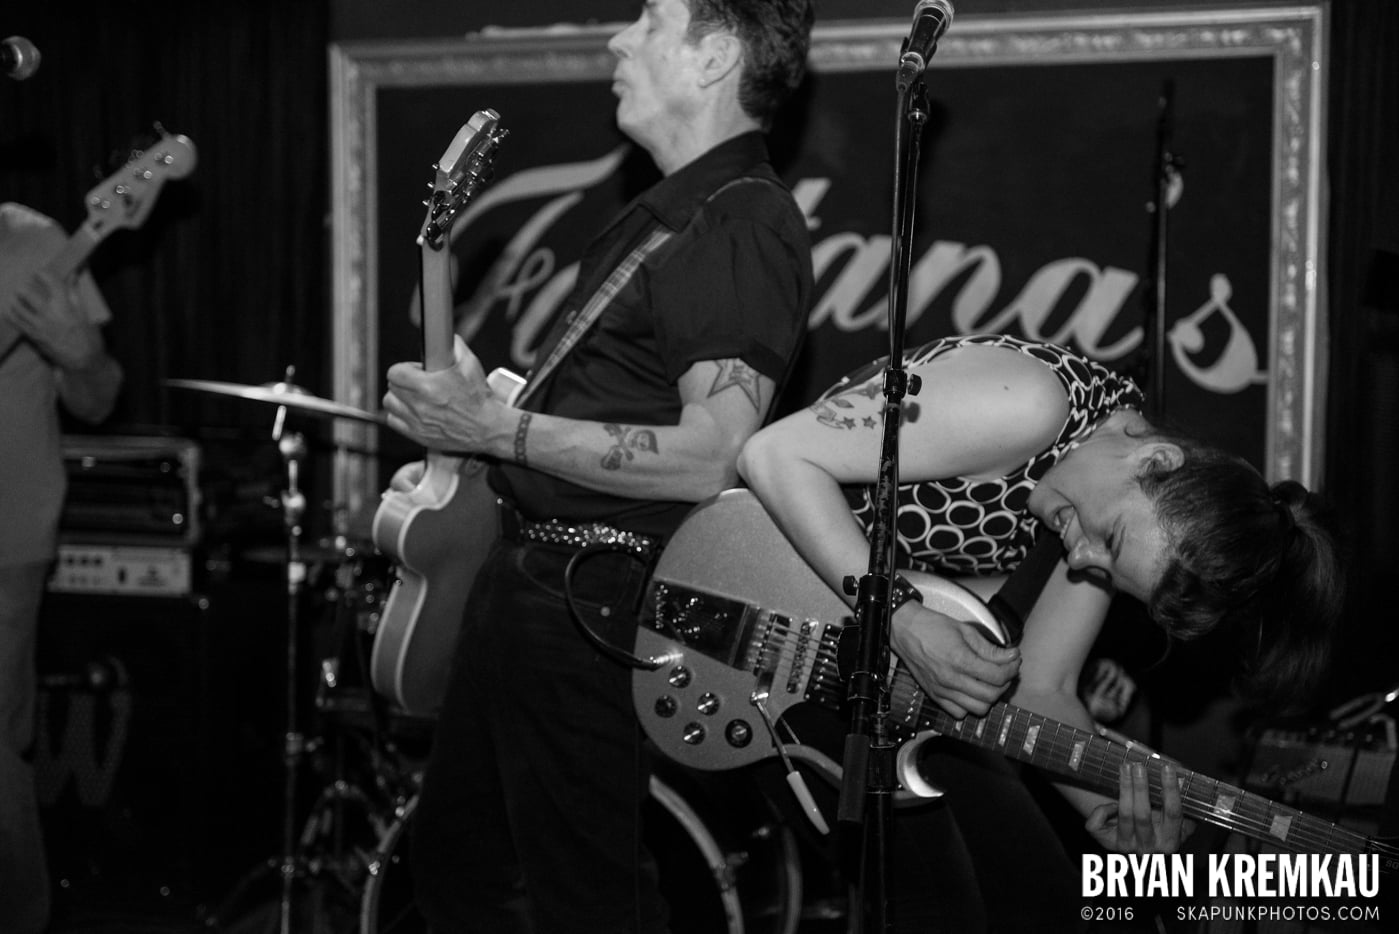 Roddy Radiation & The Scotch Bonnets @ Fontana's, NYC - 4.25.15 (5)